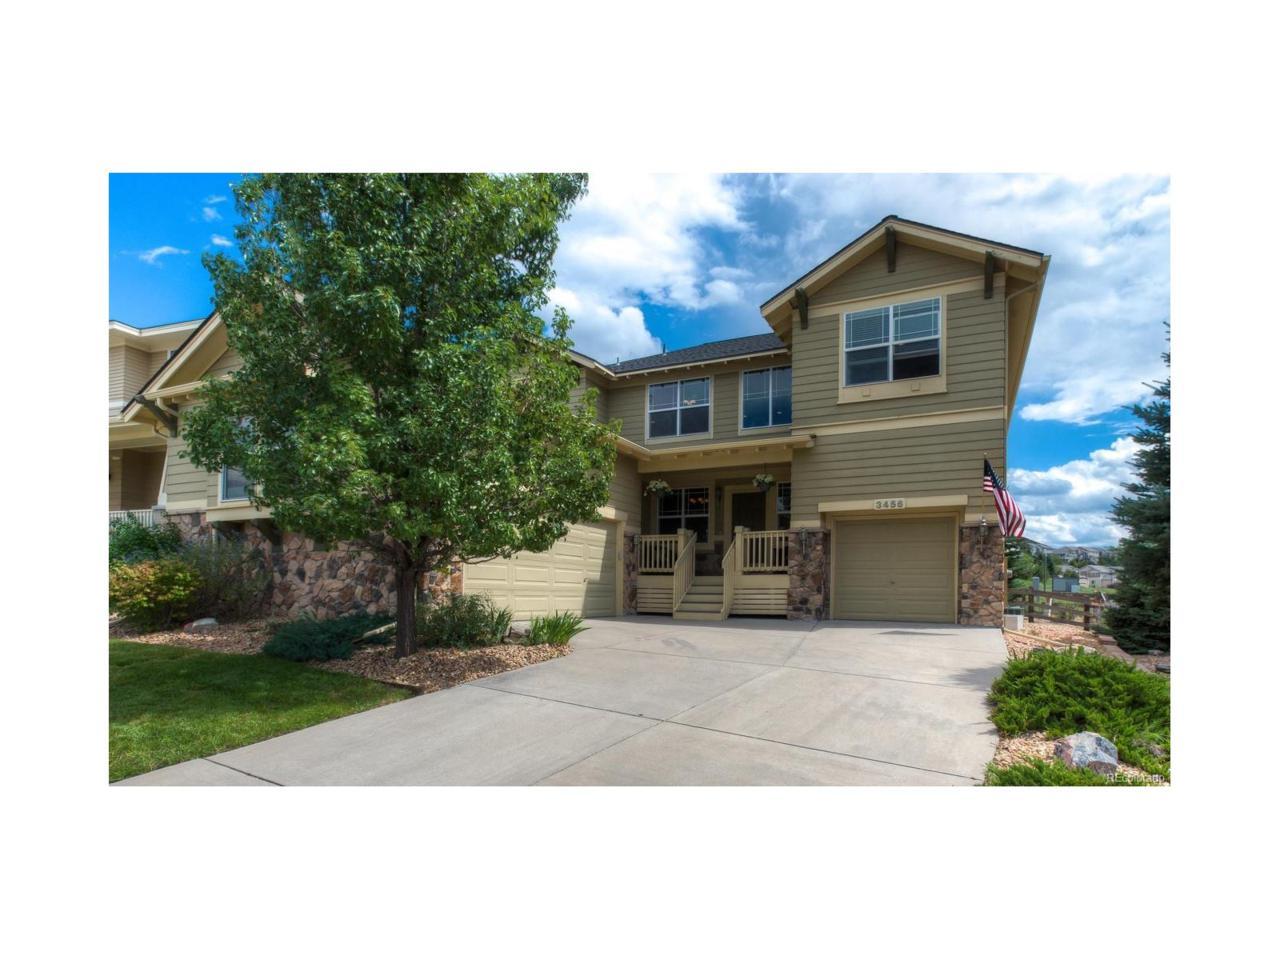 3456 Fantasy Place, Castle Rock, CO 80109 (MLS #8980466) :: 8z Real Estate